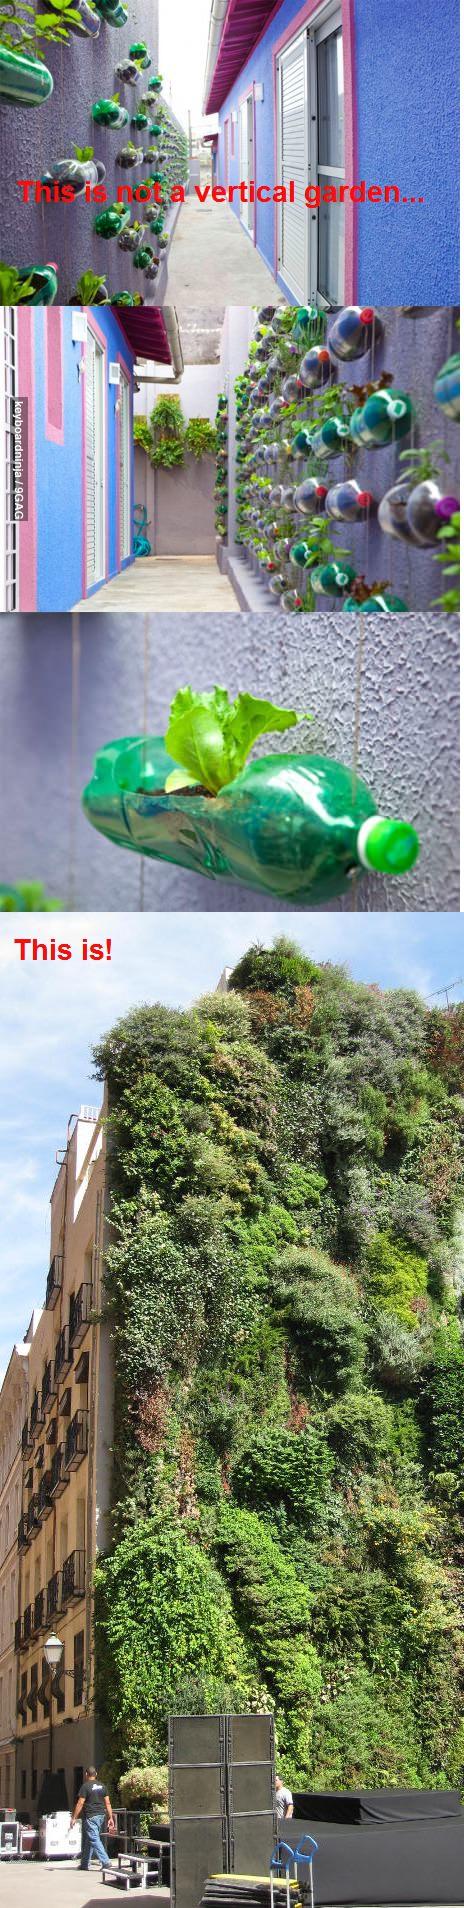 Vertical garden:-)